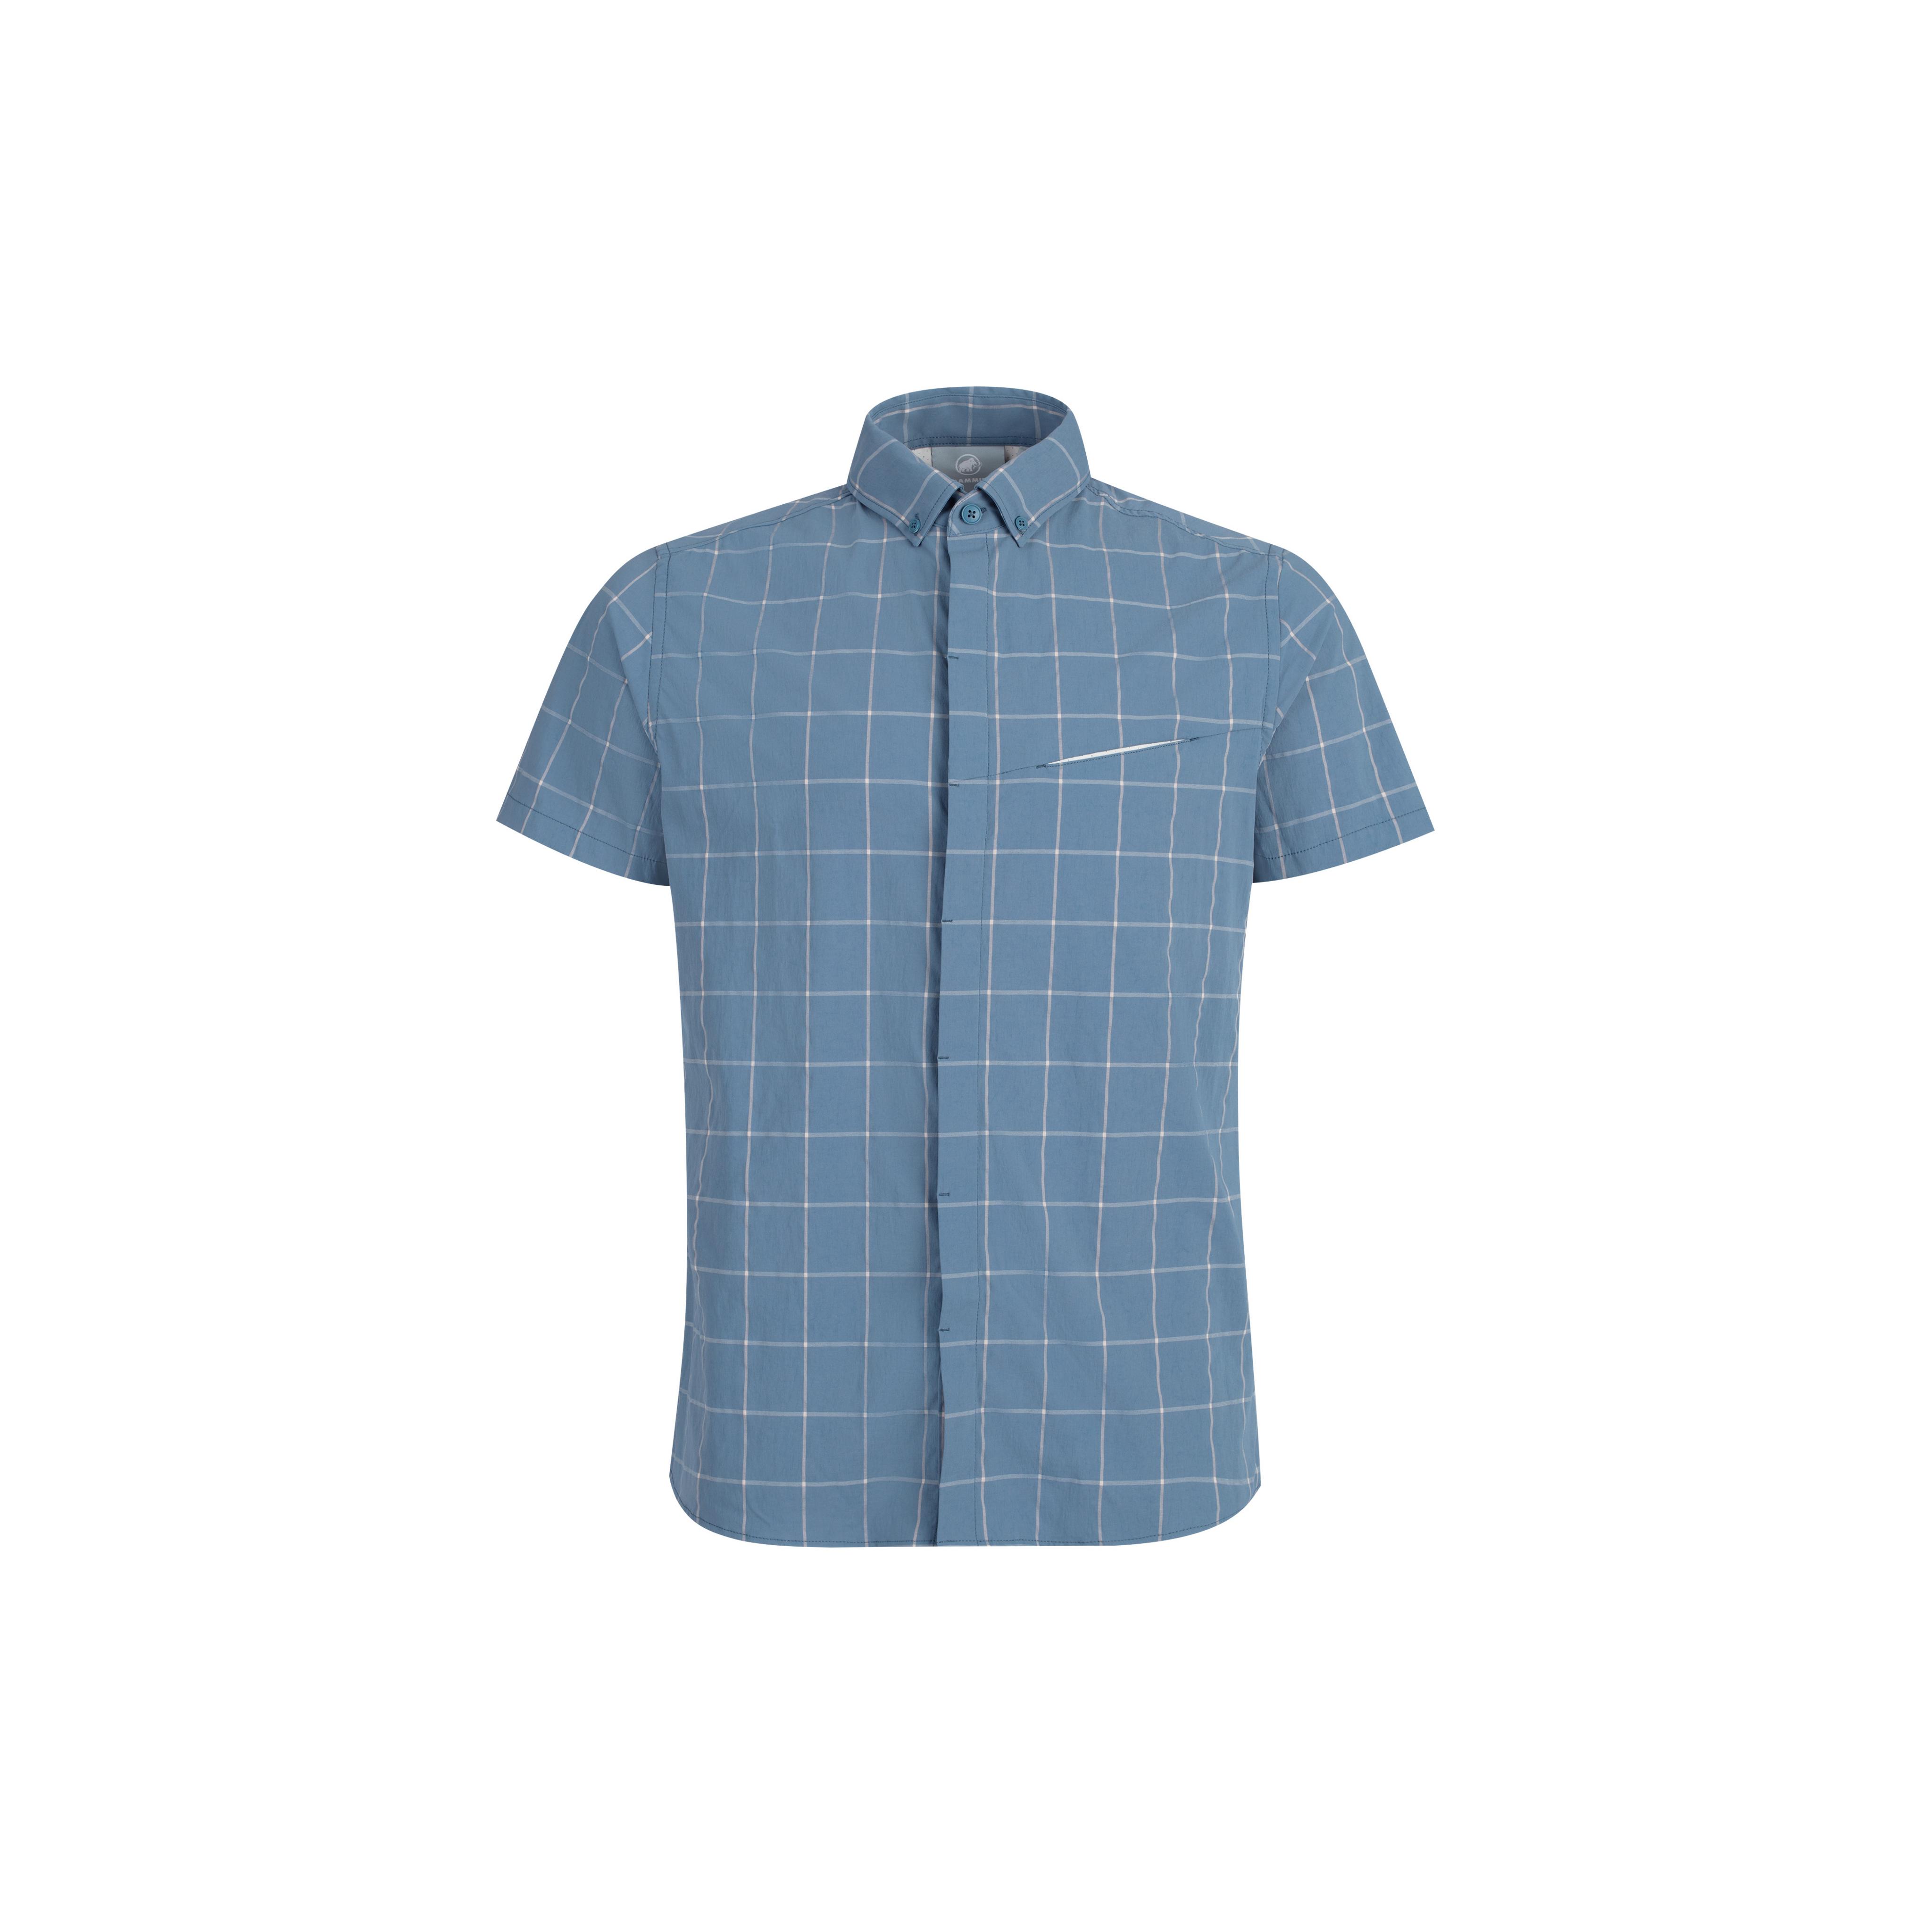 Mountain Shirt Men - horizon-highway, S thumbnail